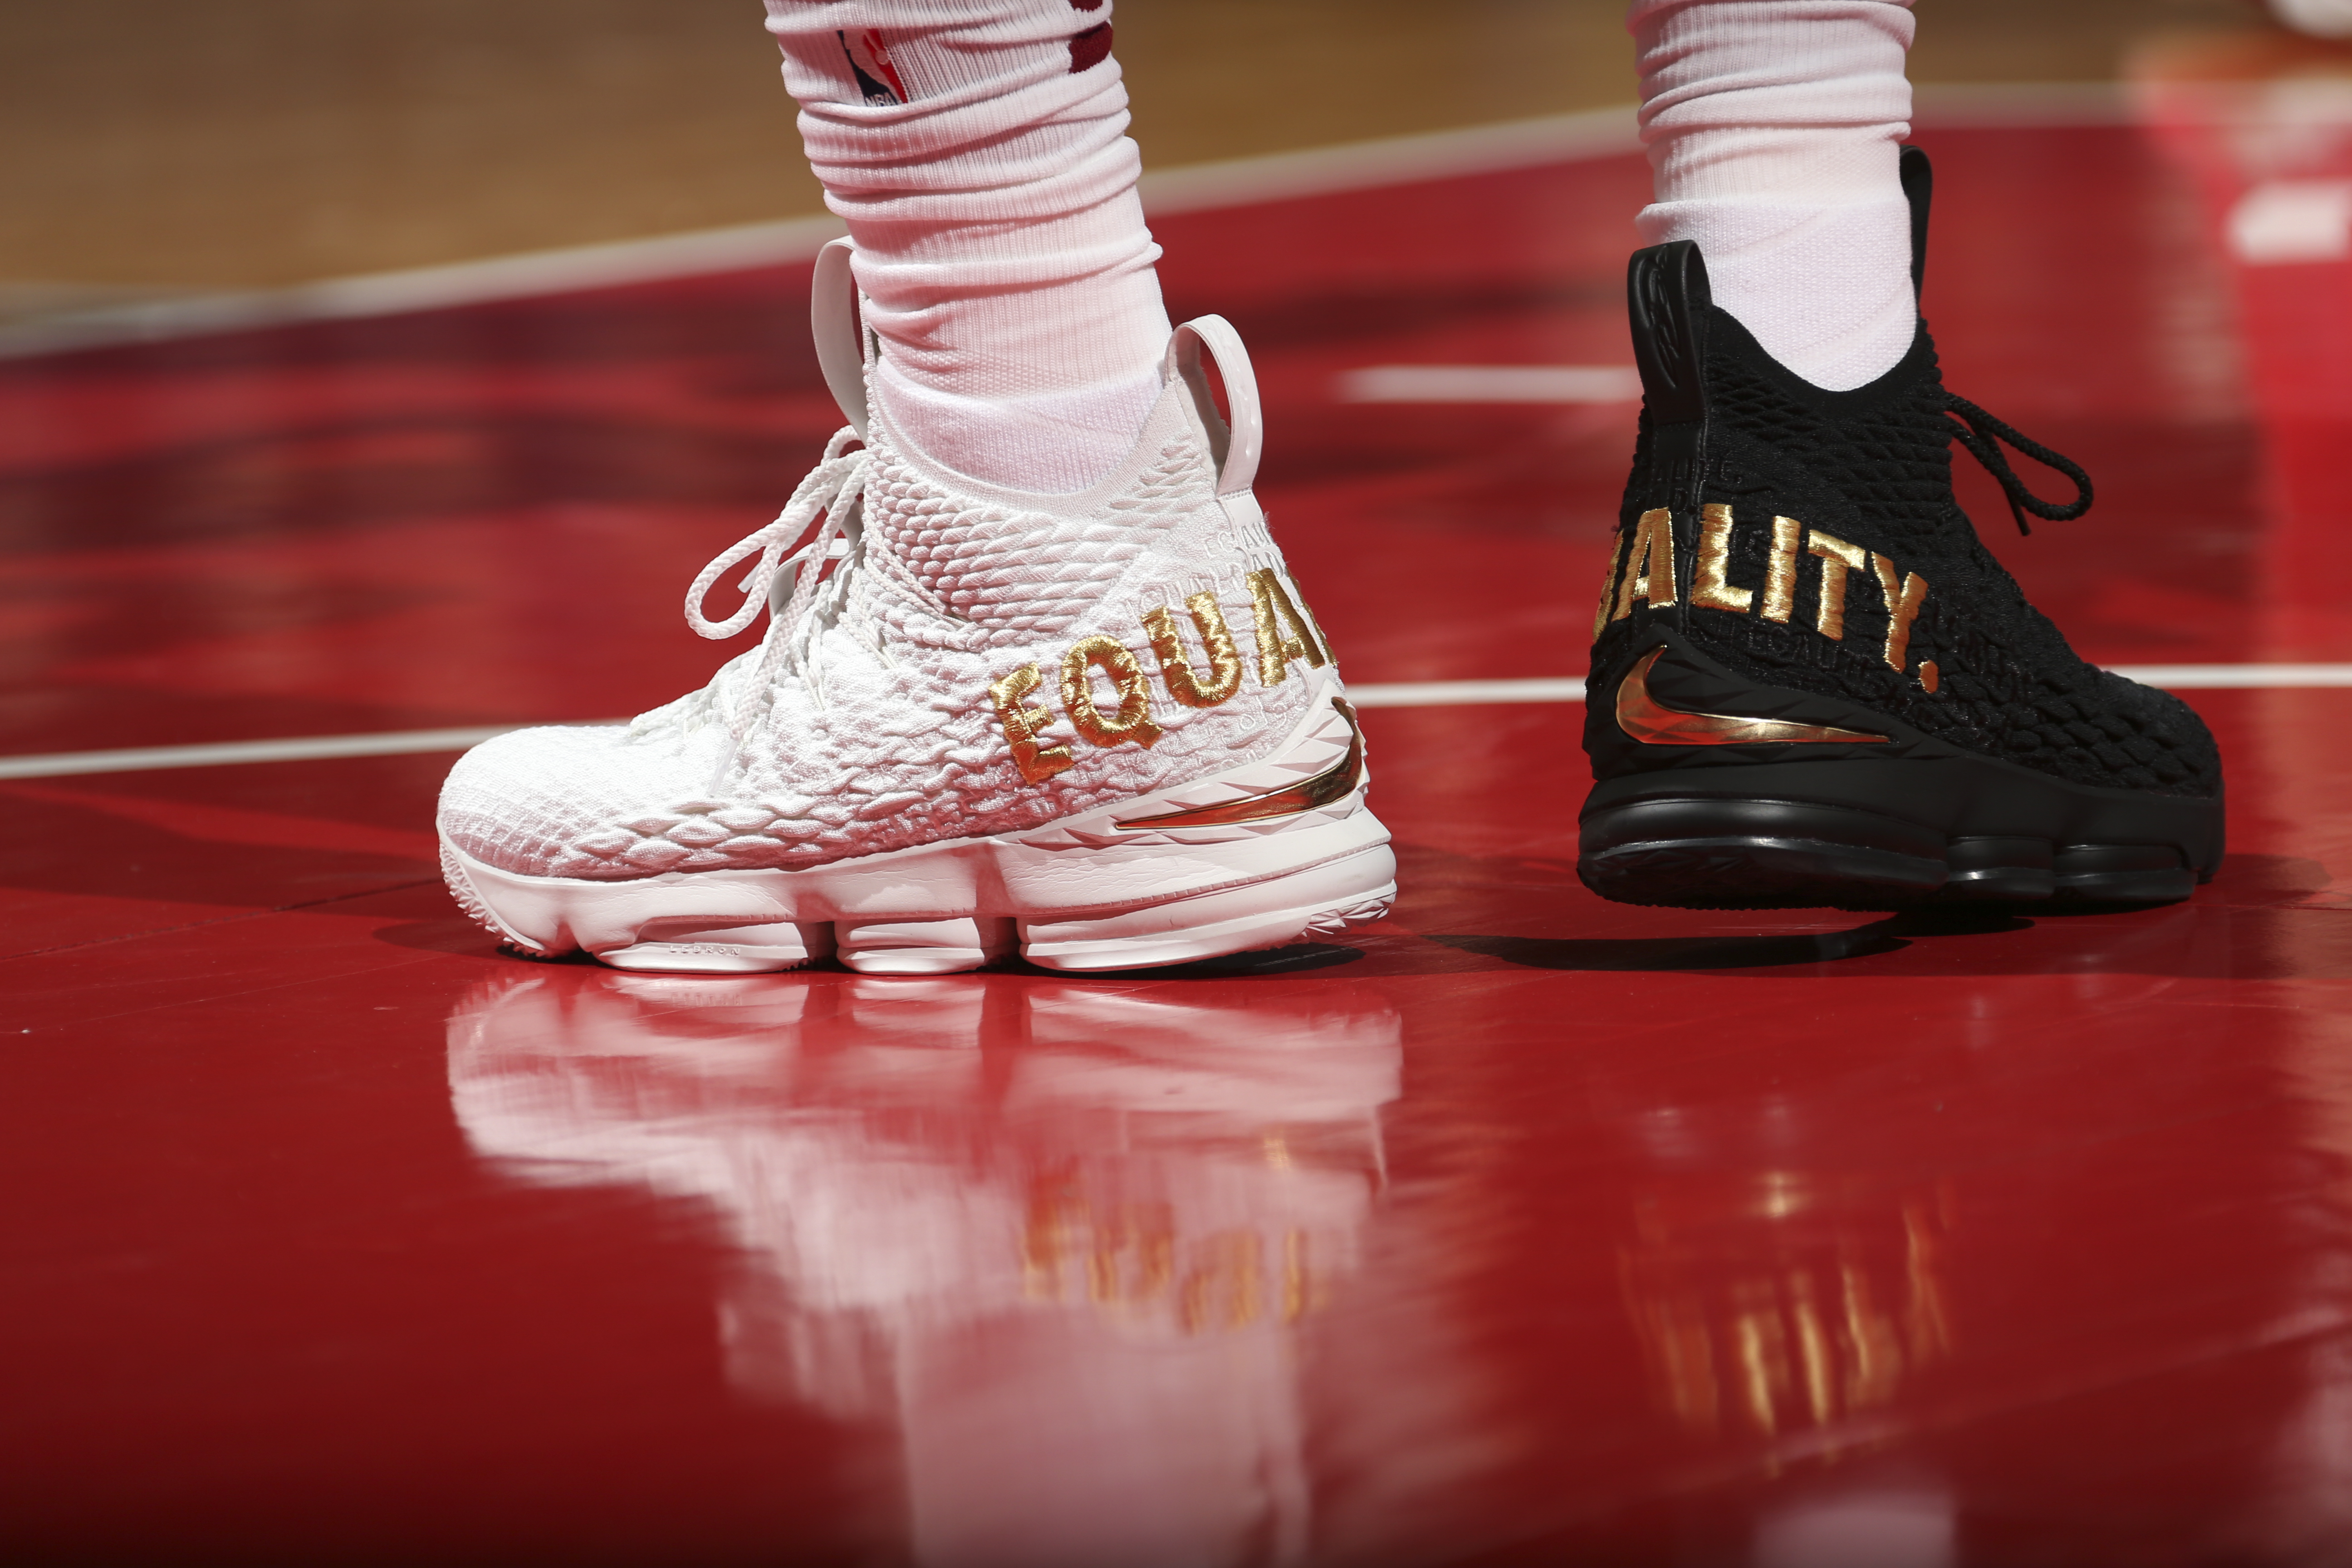 LeBron James wear one white shoe